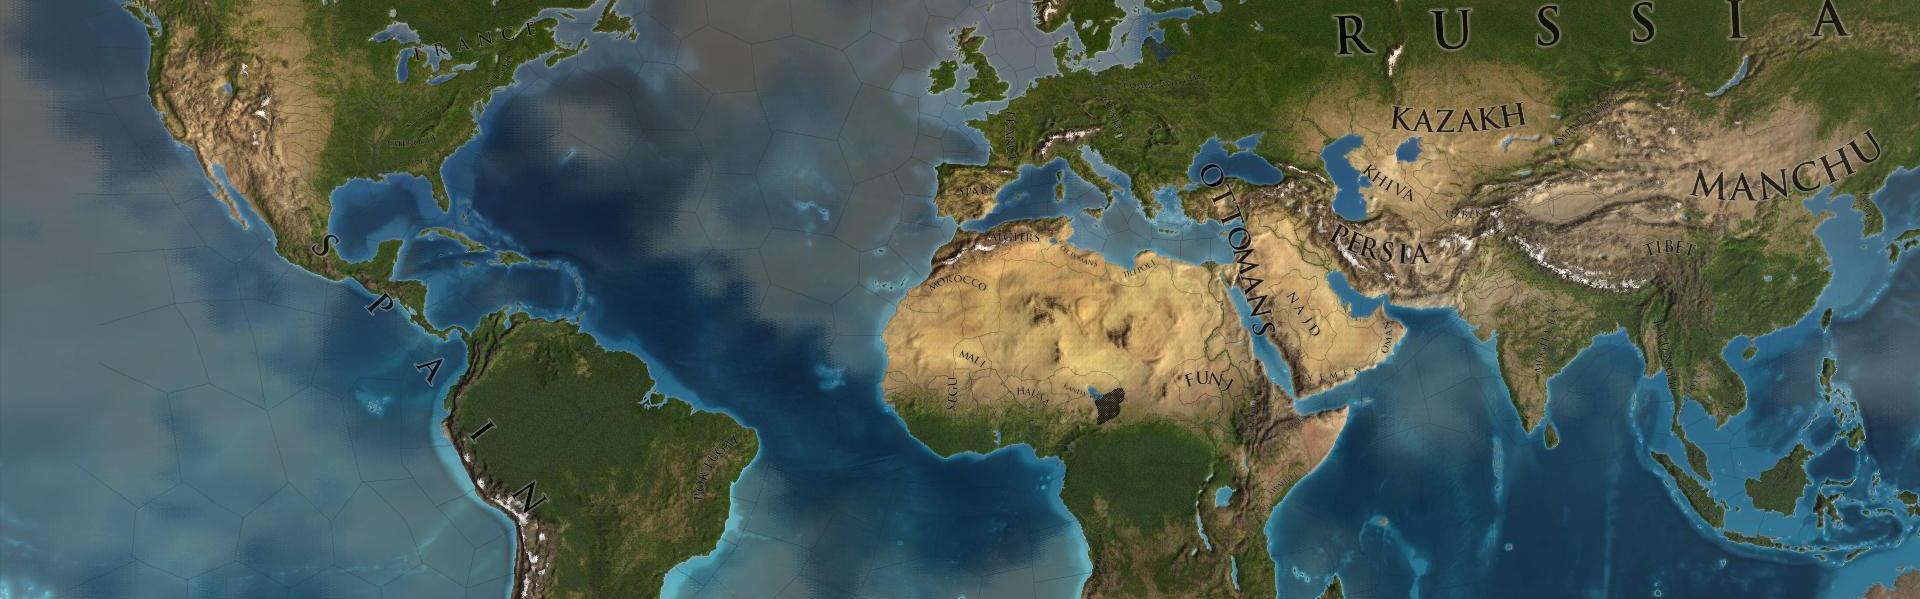 Europa Universalis IV - Cradle of Civilization Content Pack (DLC) Steam Key EMEA / UNITED STATES